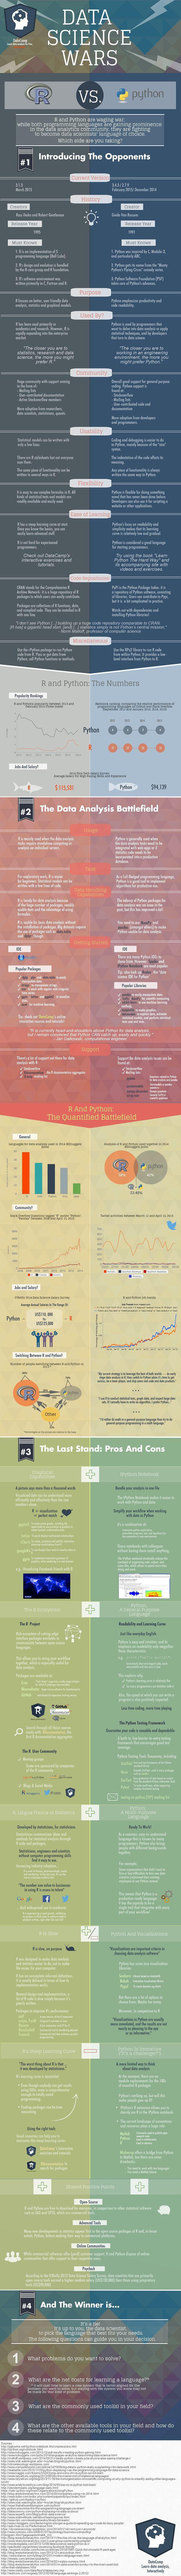 Data Science Wars: R versus Python - Data Science Central